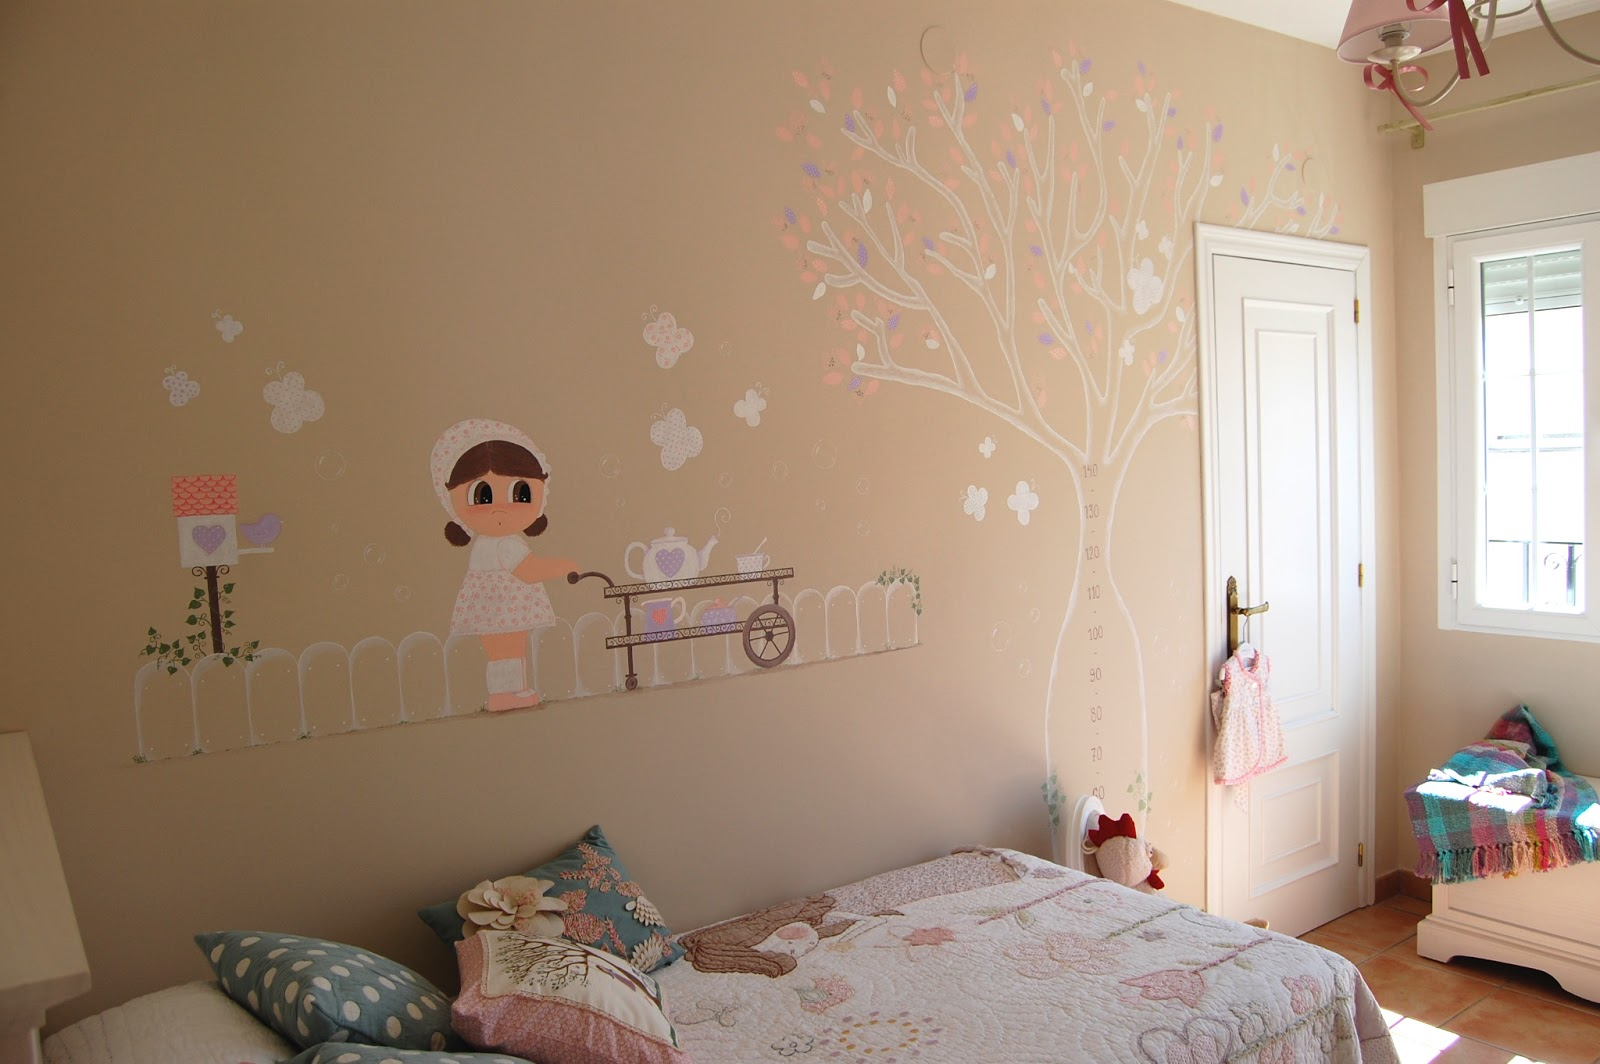 Coconic decoraci n infantil personalizada murales for Como pintar un mural en una pared